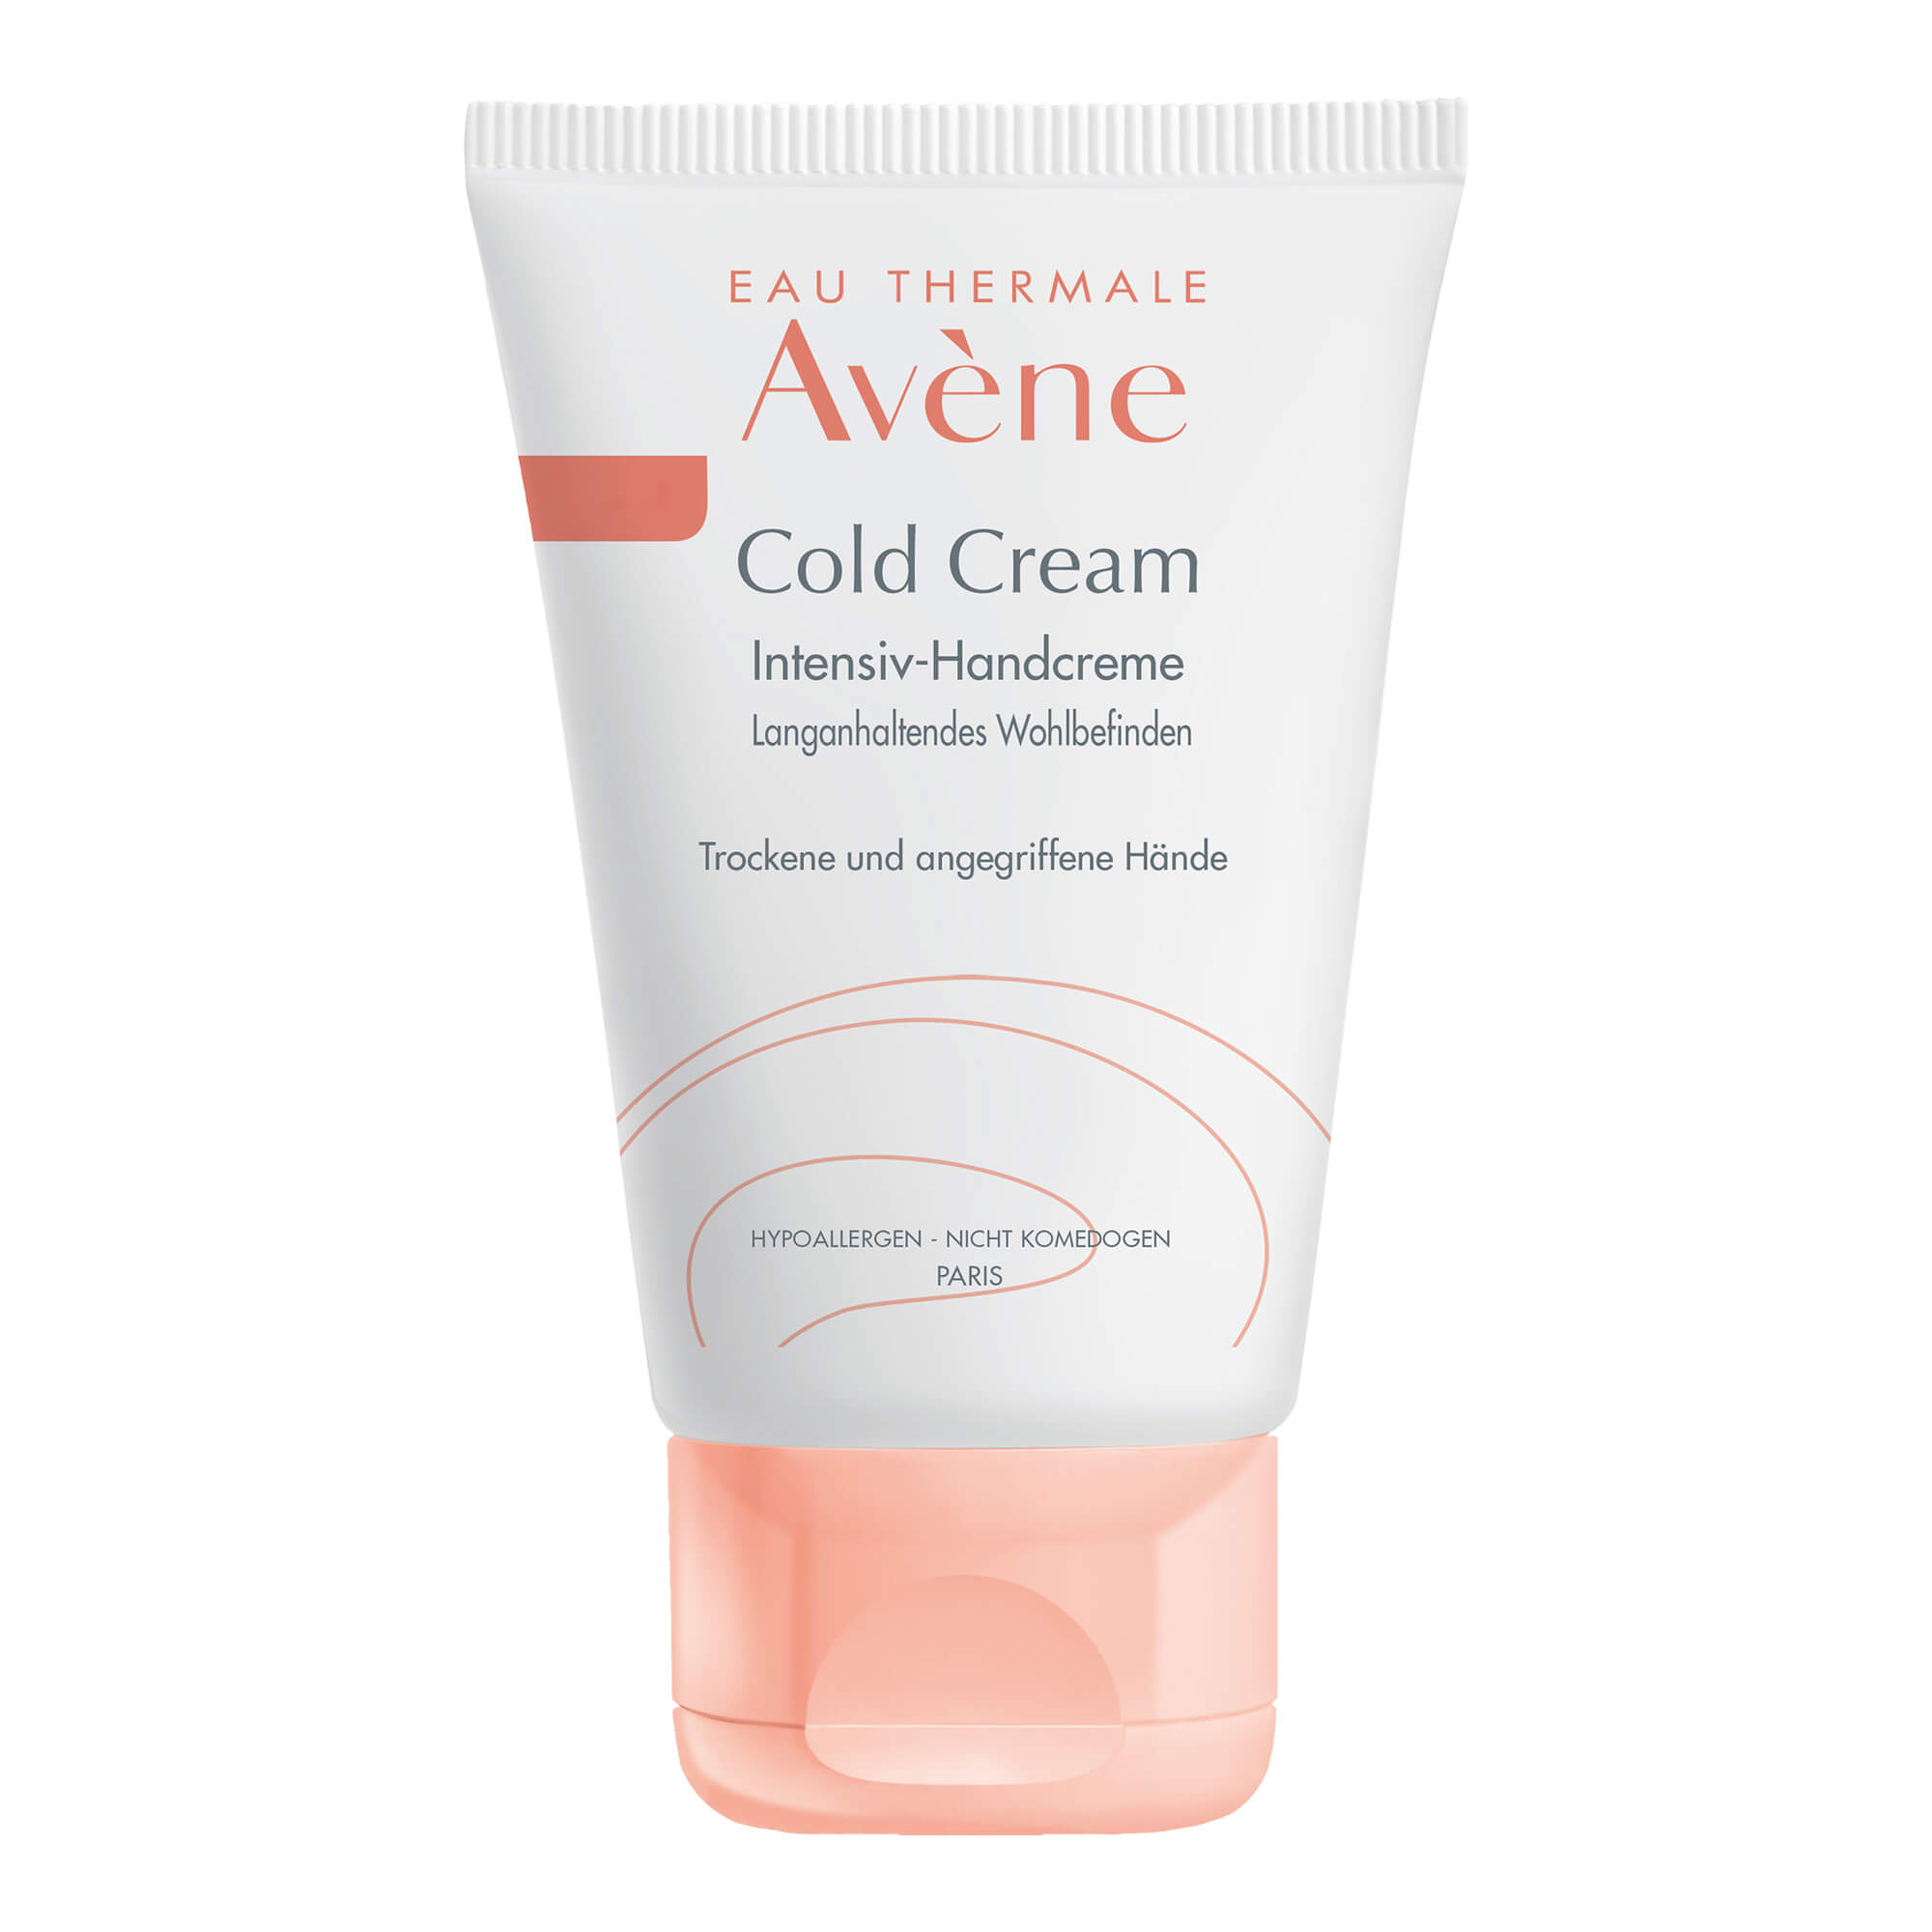 Avene Cold Cream Intensiv-Handcreme